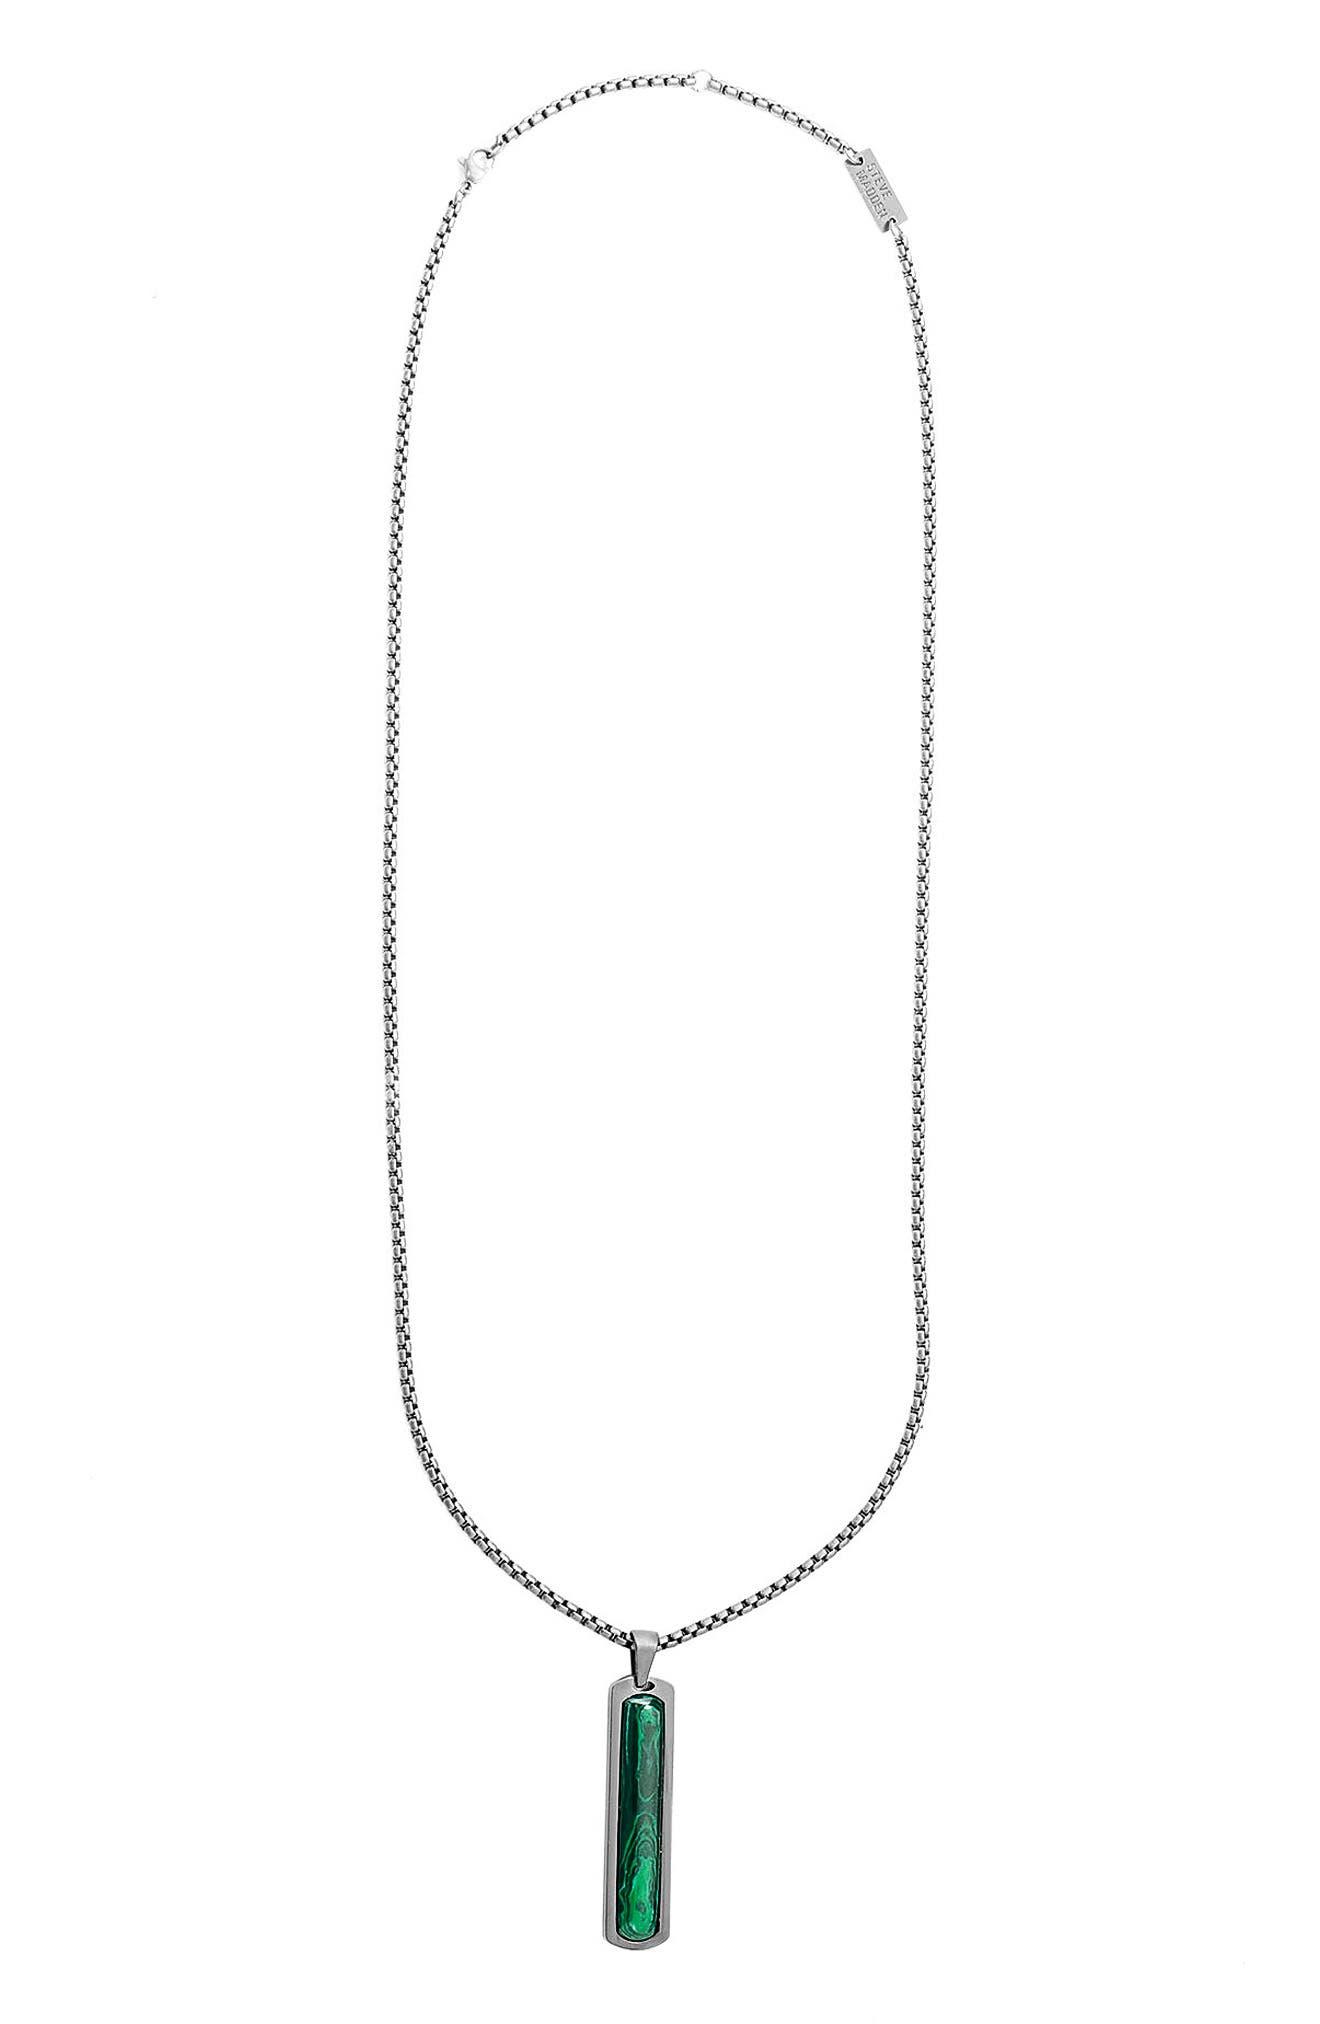 Oxidized Malachite Pendant Necklace,                         Main,                         color, 300